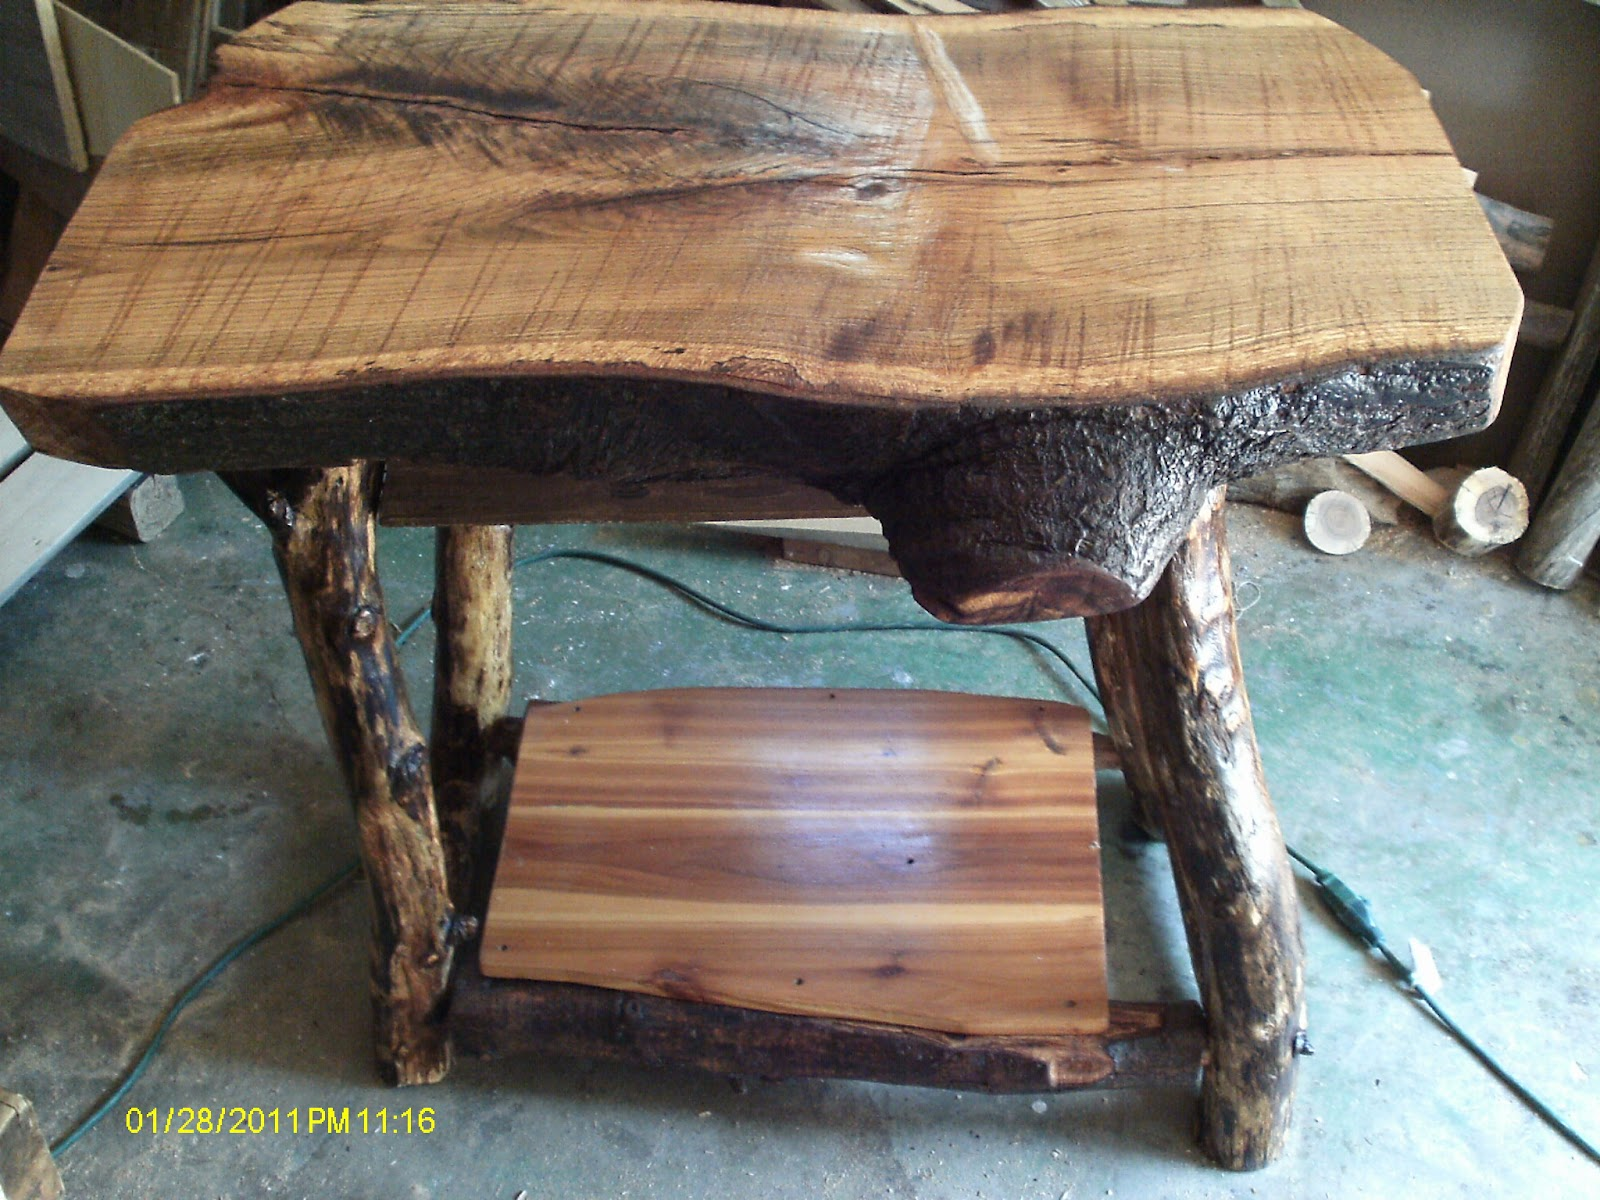 handmade rustic log furniture oak log kitchen island rh handmadelogfurniture blogspot com Rustic Log Furniture Oak Wood Furniture